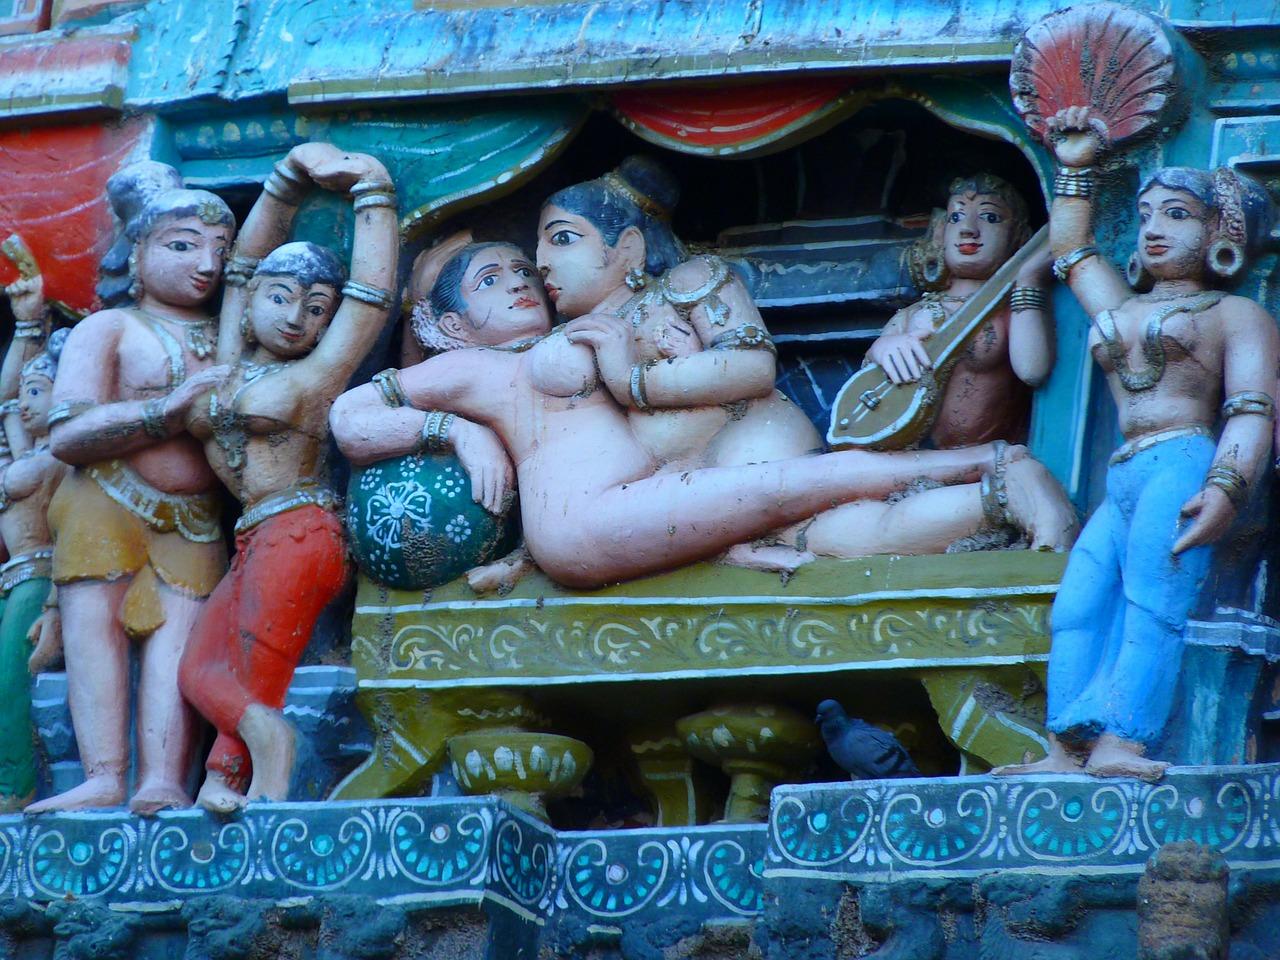 temple figures 52012 1280 - 【エロ情報】 女性の人生を充実させるオナニーガイド:初心者編